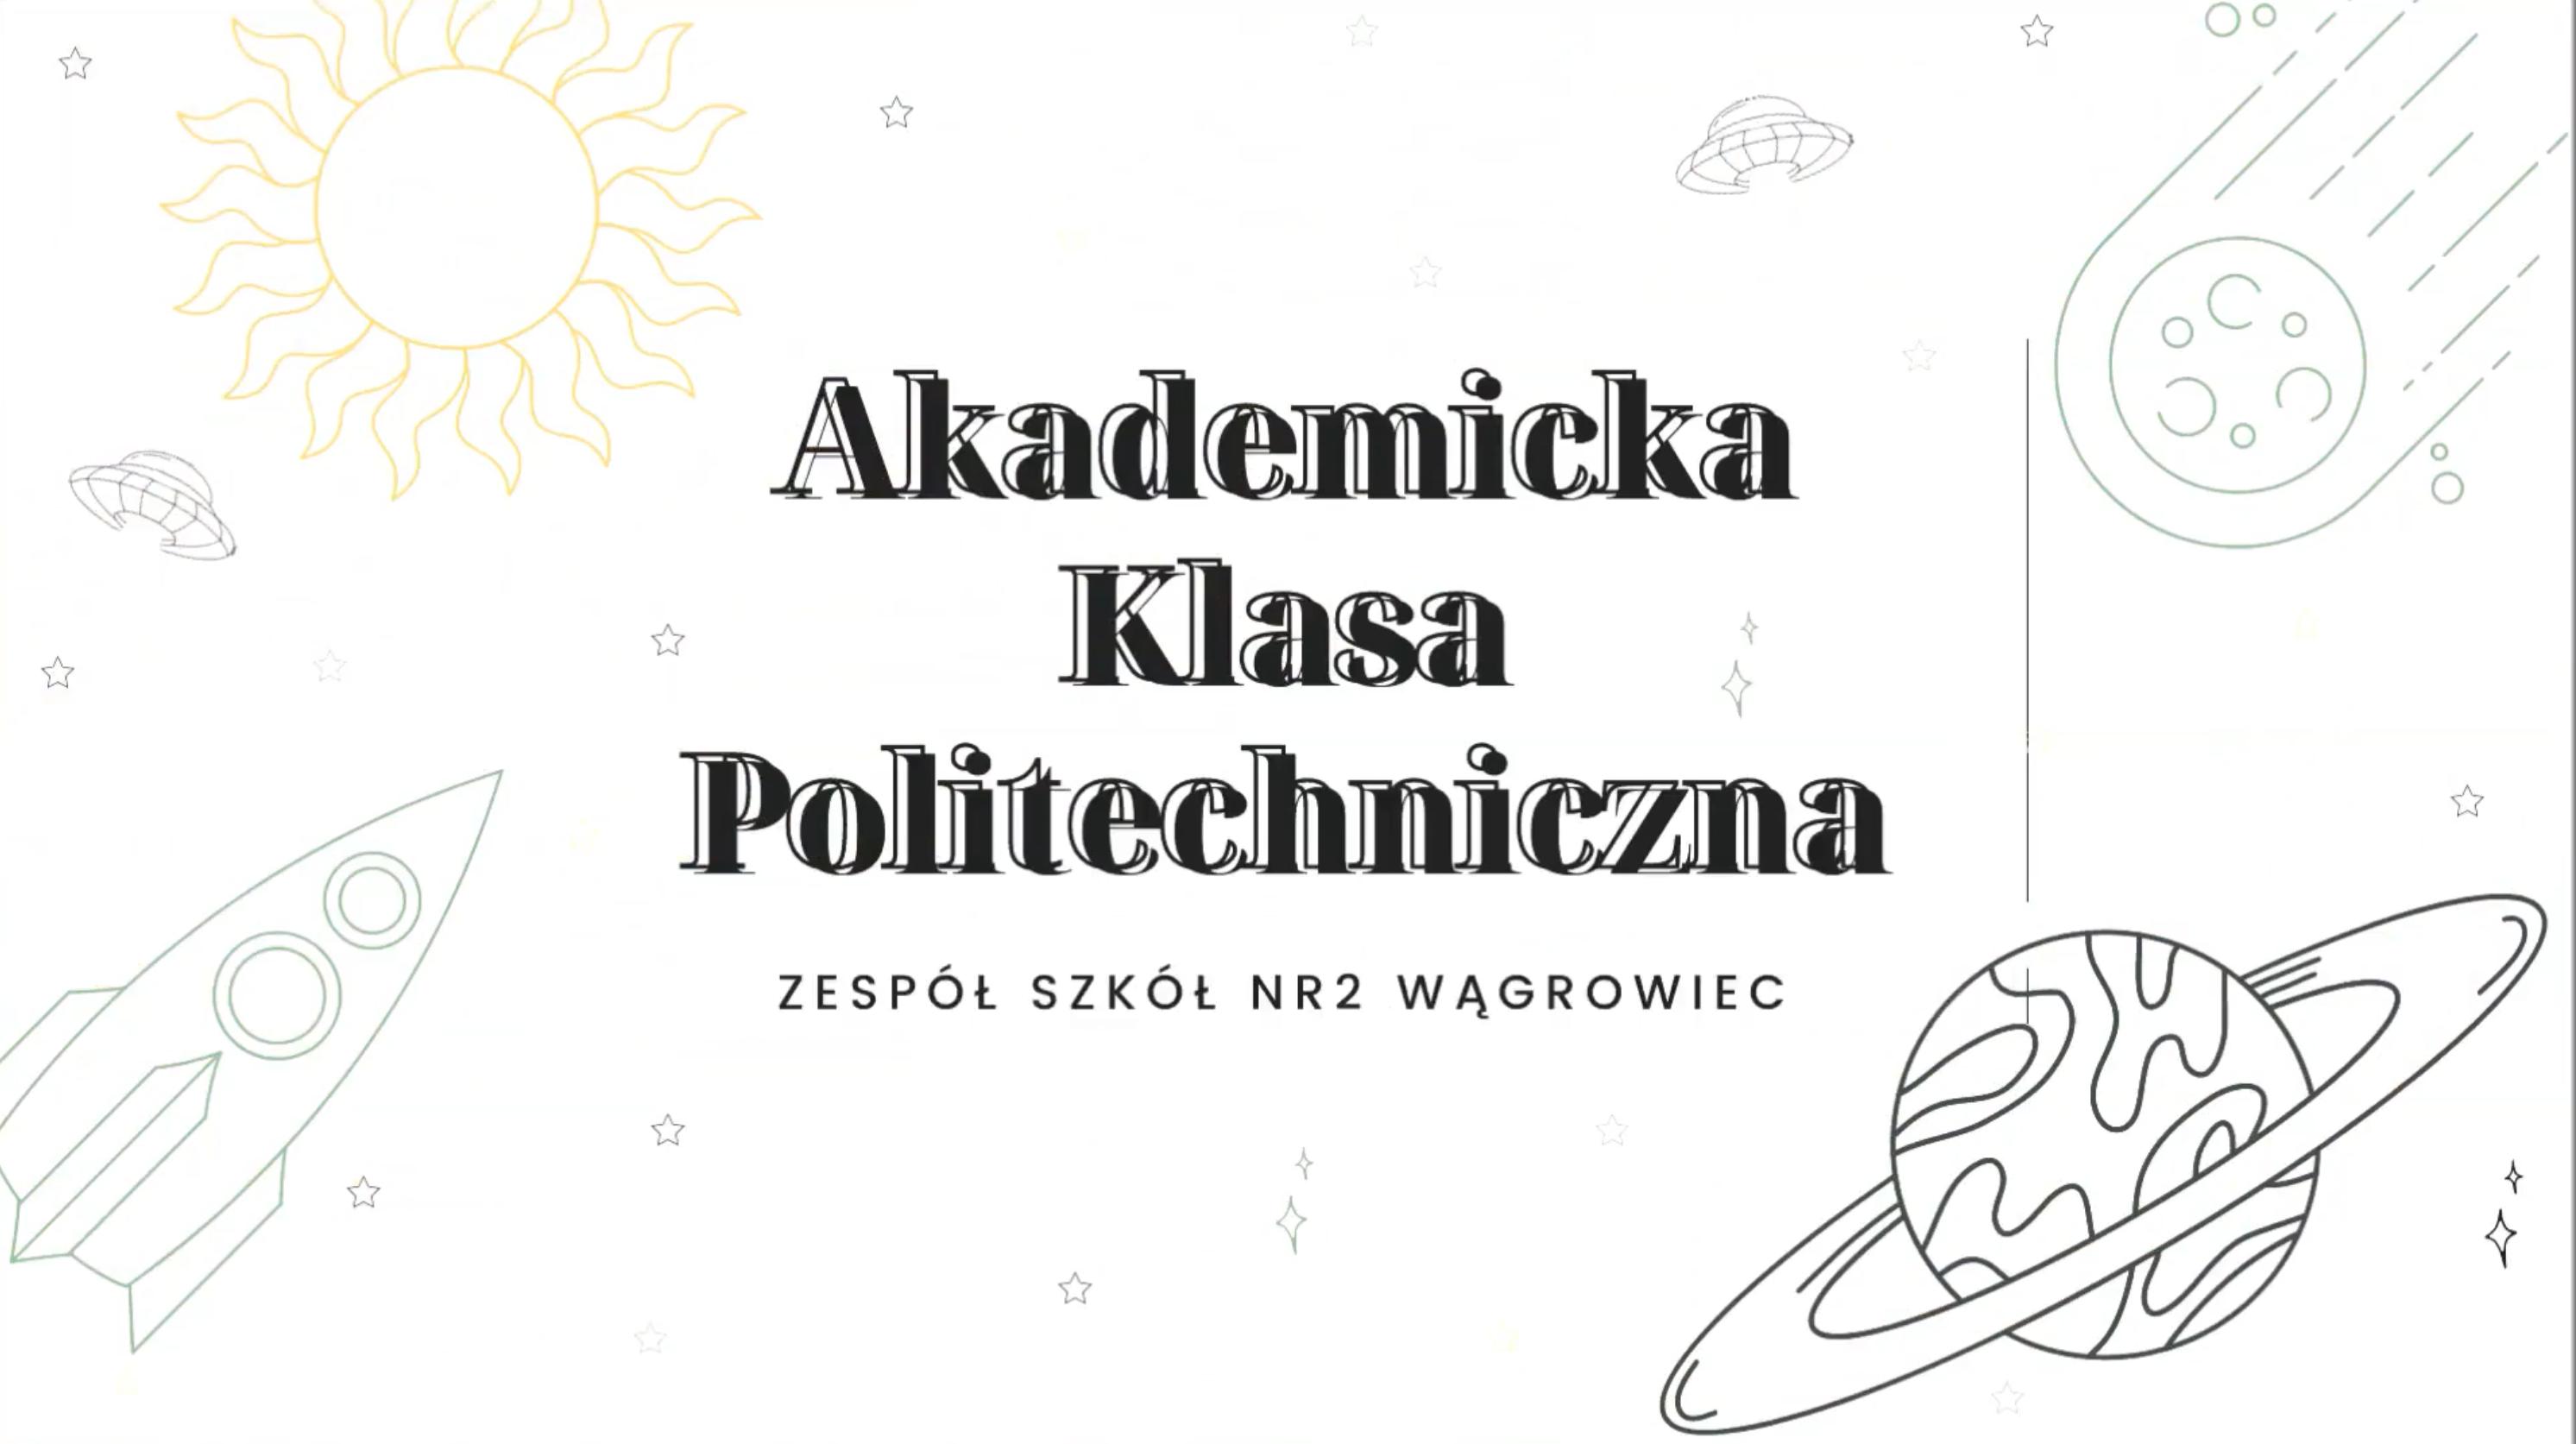 Akademicka Klasa Politechniczna